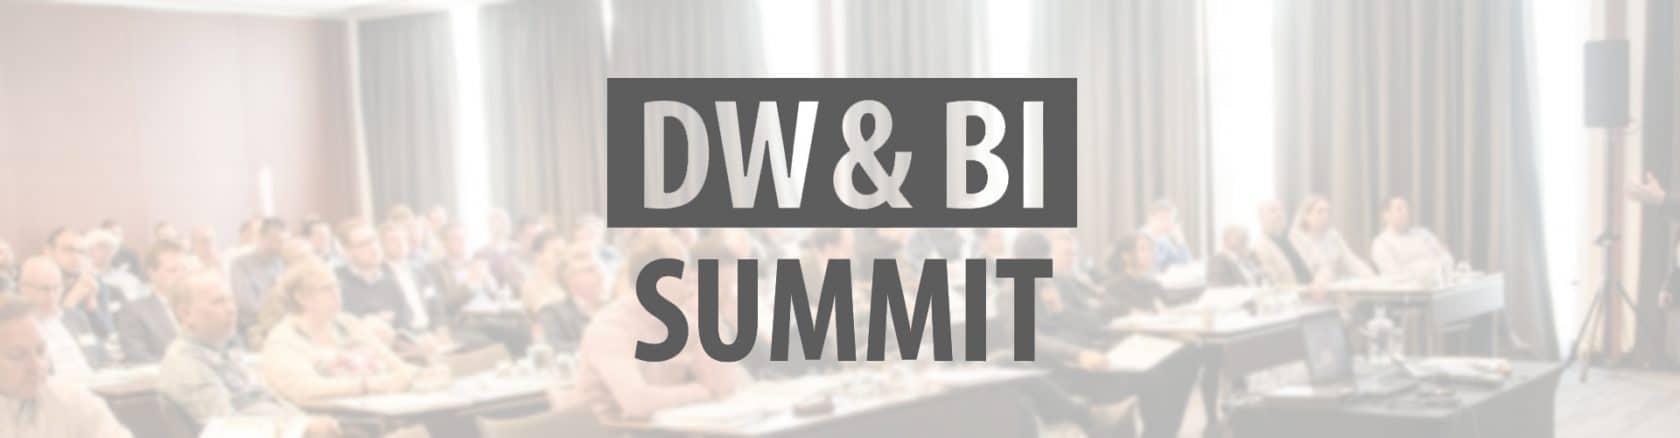 data warehousing,data warehouse, majken sander, e-mergo, timextender, discovery hub, dwbi summit. dw&bi summit,